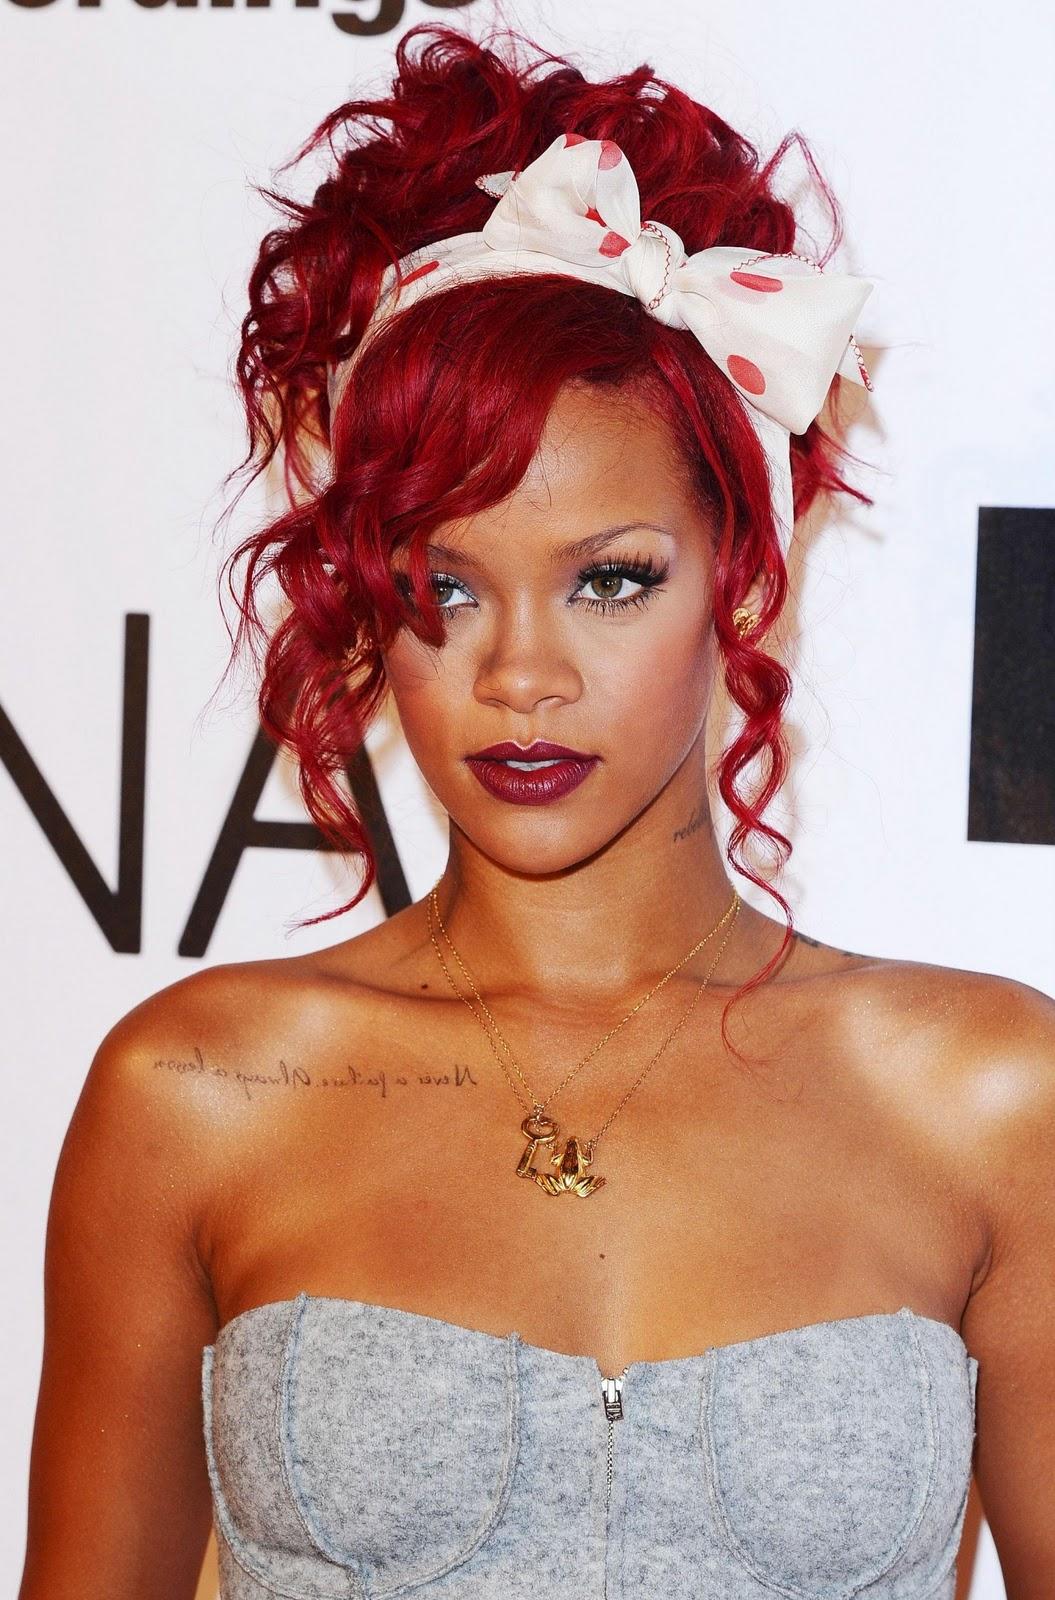 Hair Envy 101 Scarlet Fever 30somethingmel